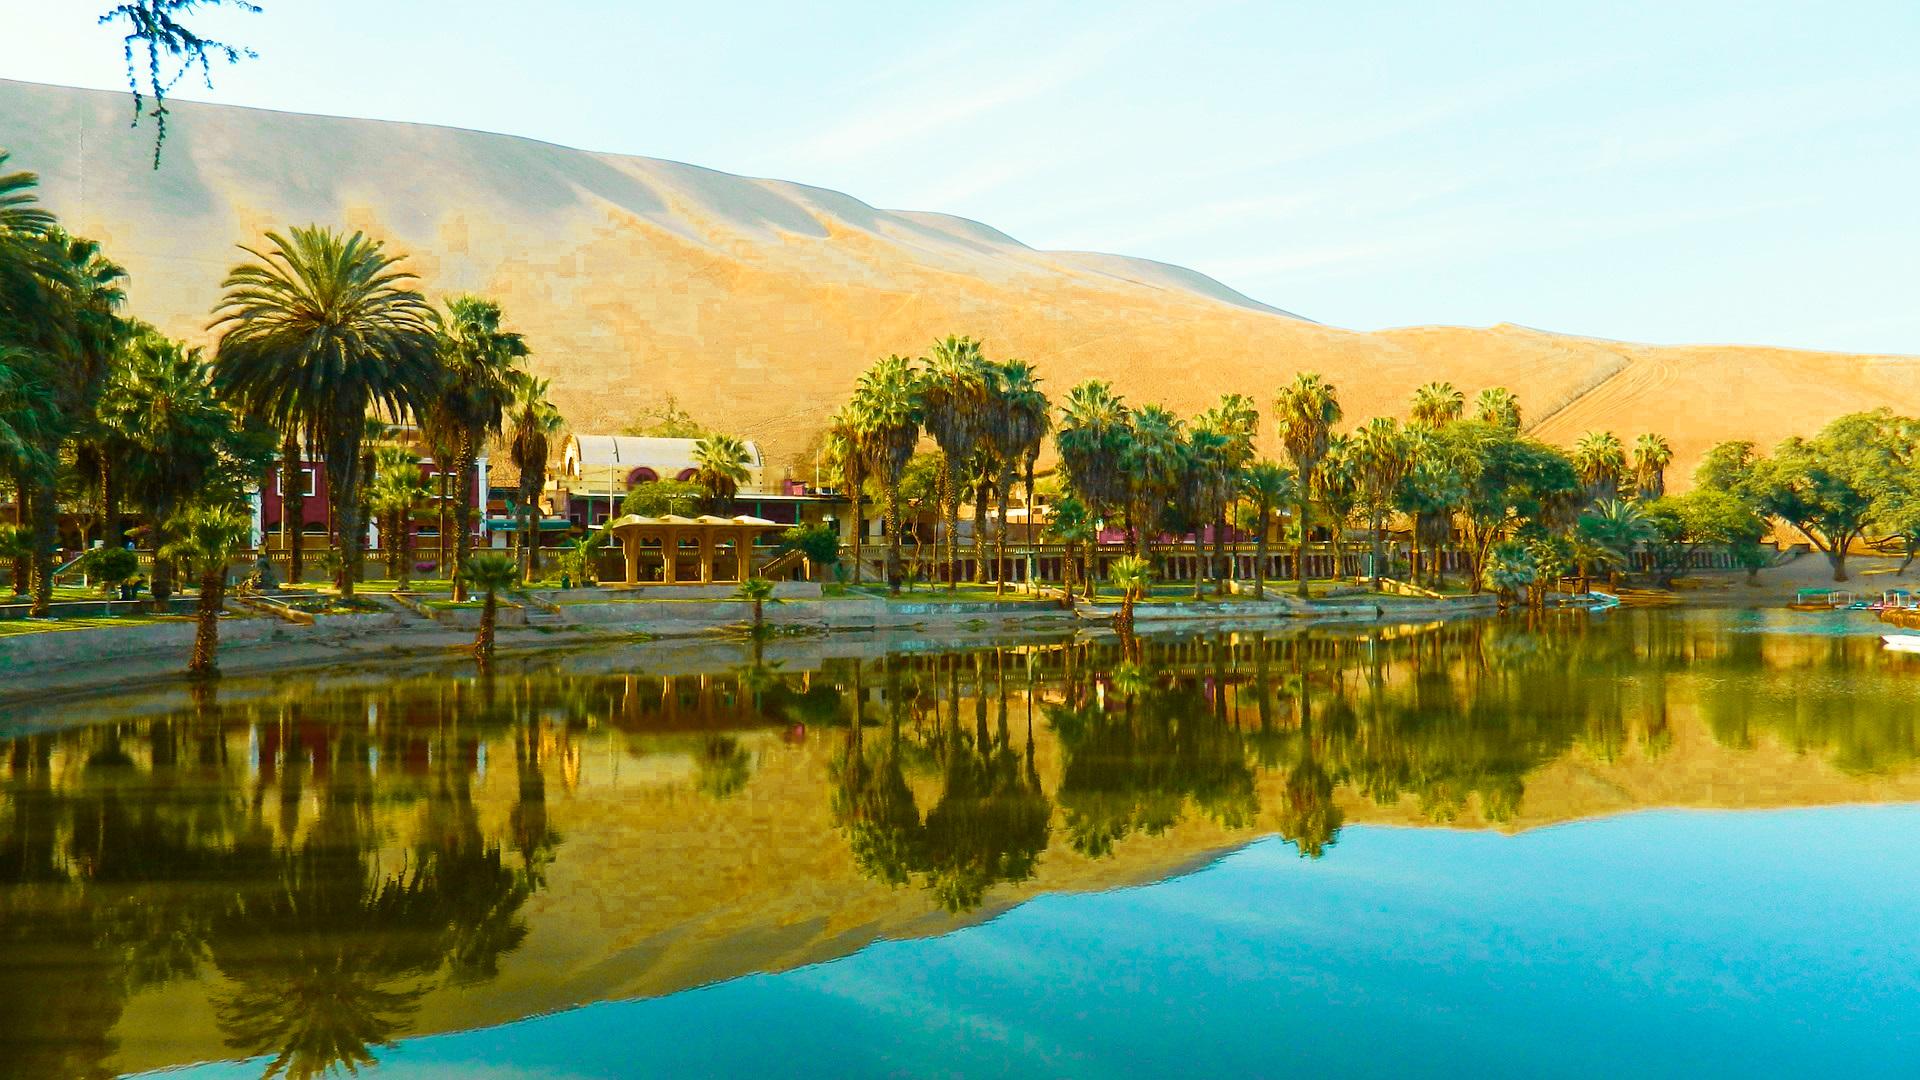 wielkie miasta huacachina oaza peru angellovesdreams bloggerpodrozniczy